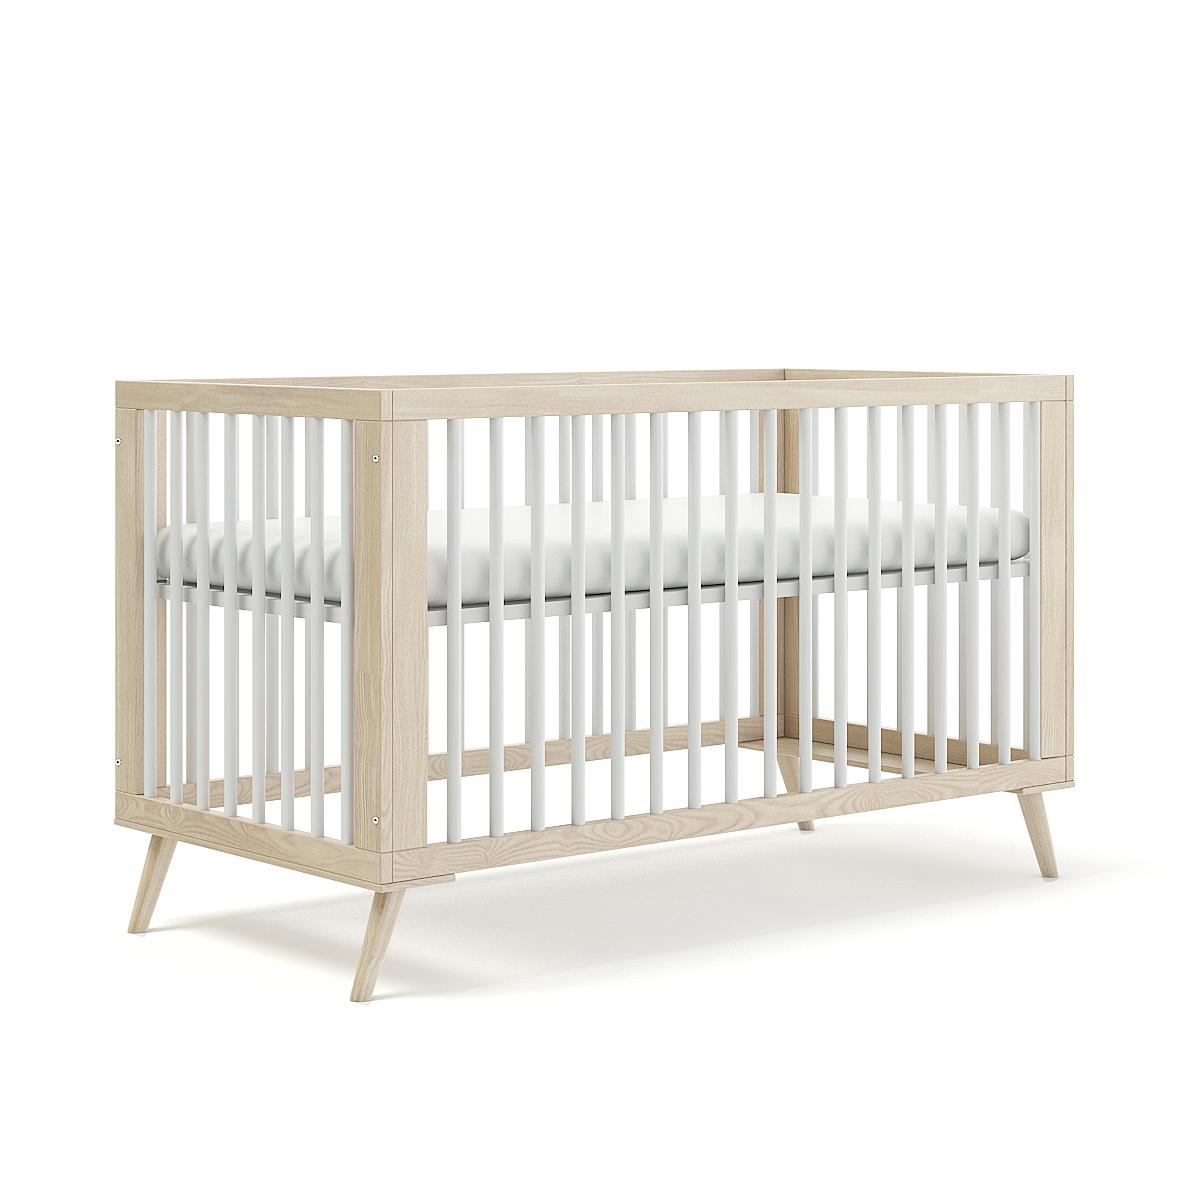 Model Tempat Tidur Bayi Terbaru